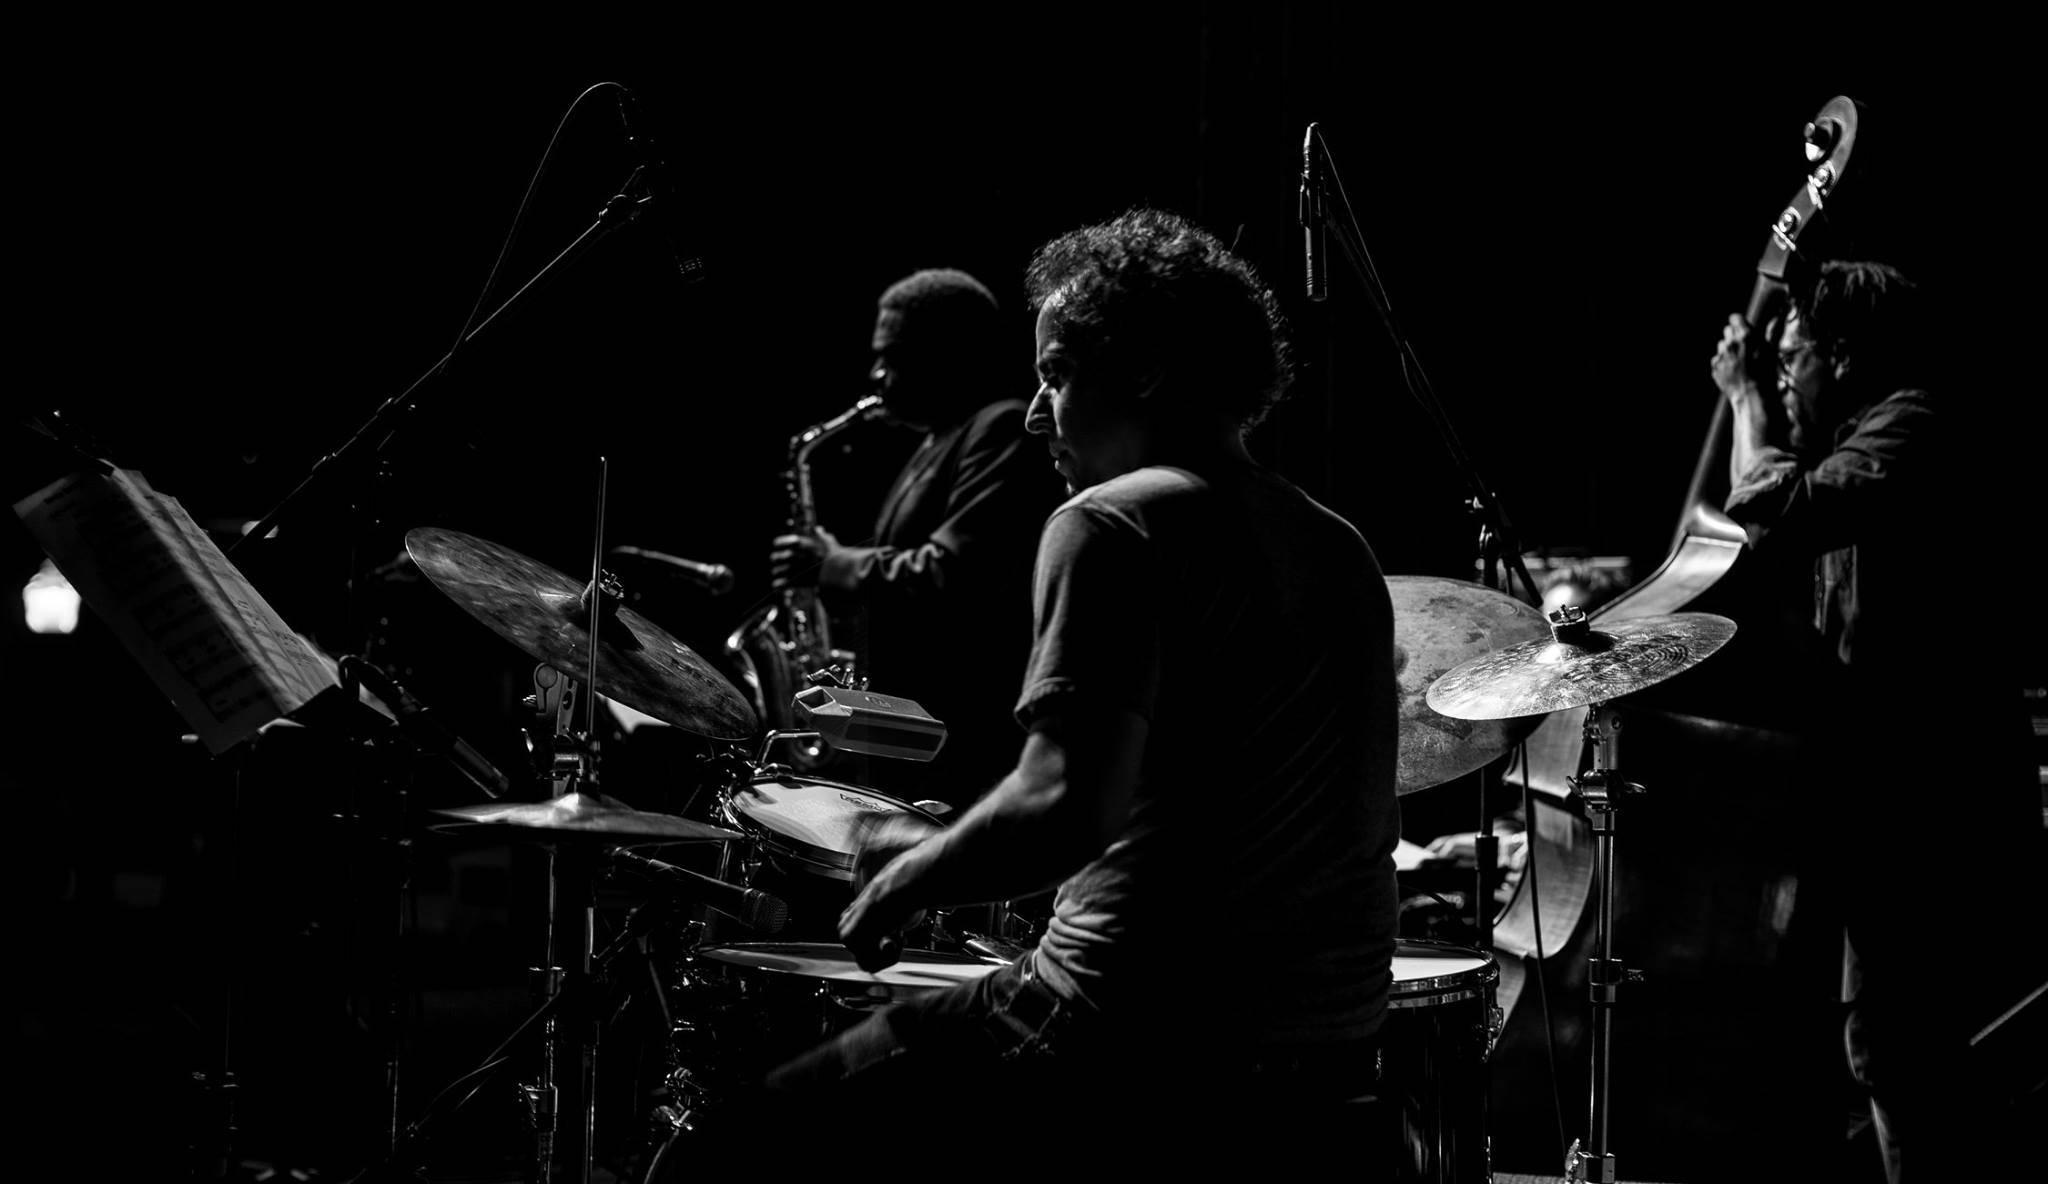 Dafnis Prieto, Yosvani y Yunior Terry, marzo de 2017. Foto: Miri Páez Bolet.